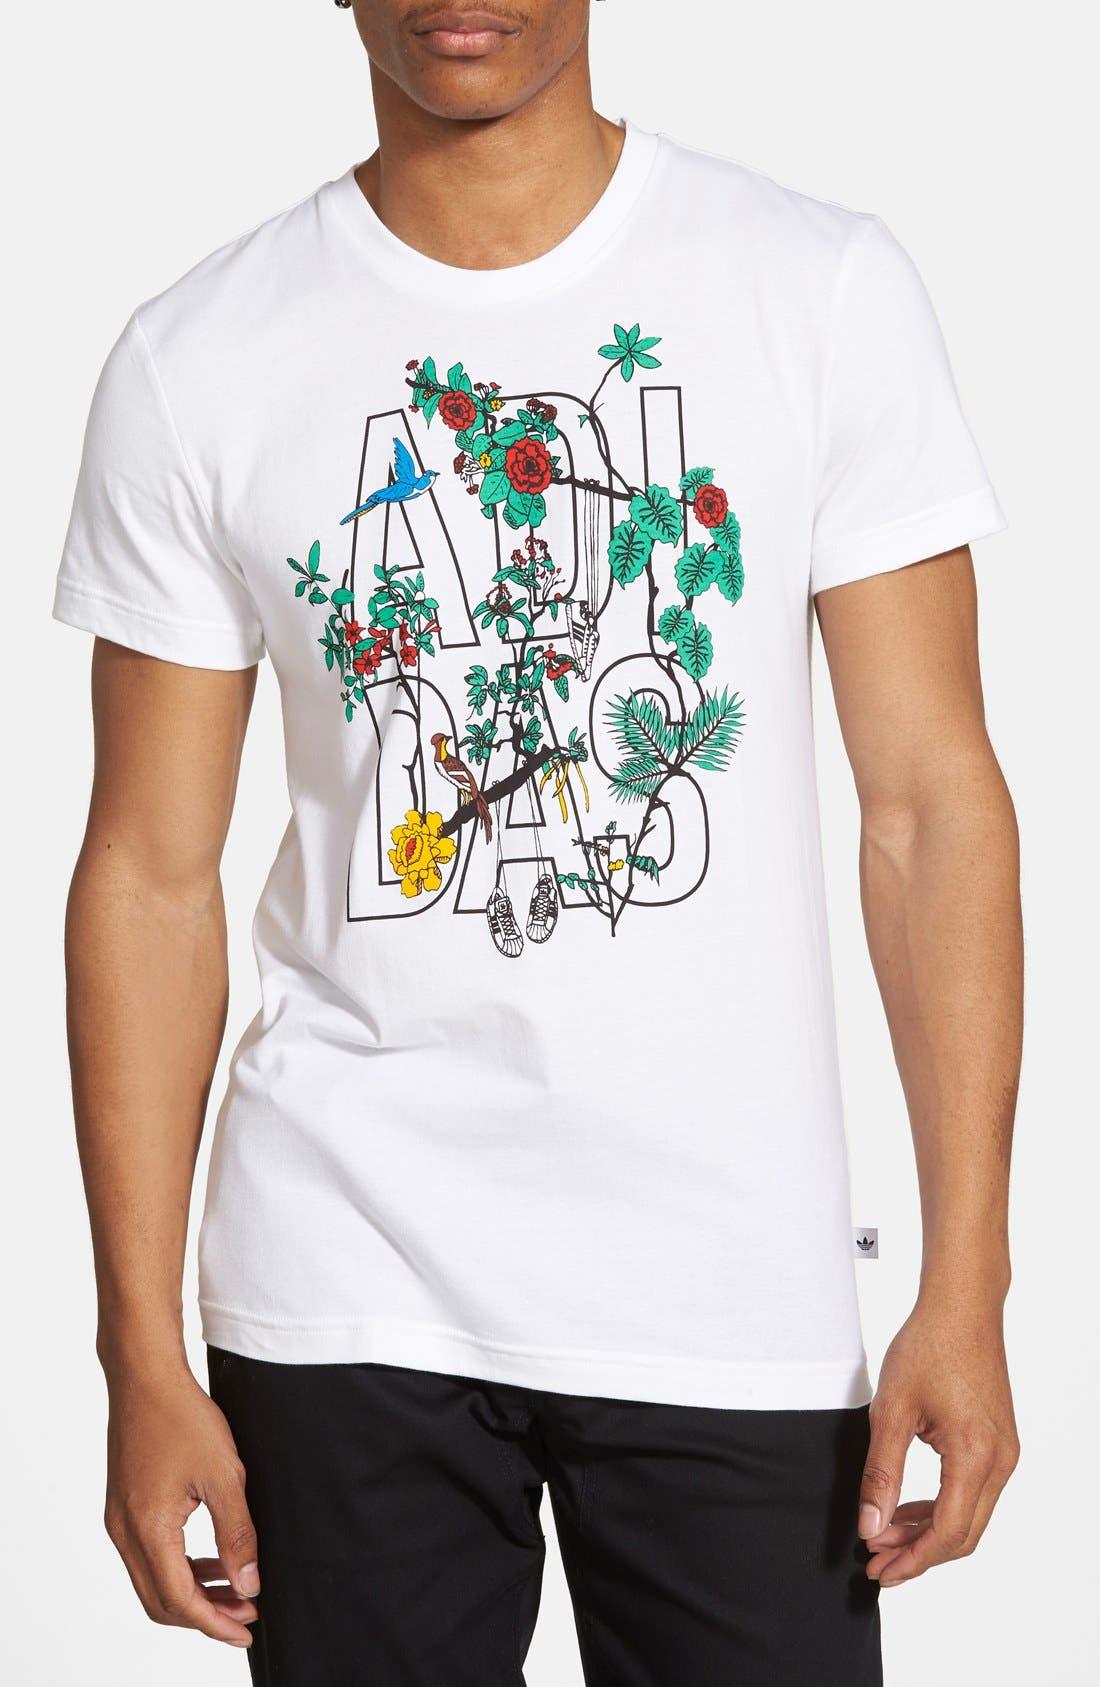 ADIDAS ORIGINALS, 'Island Superstar' Graphic T-Shirt, Main thumbnail 1, color, 100